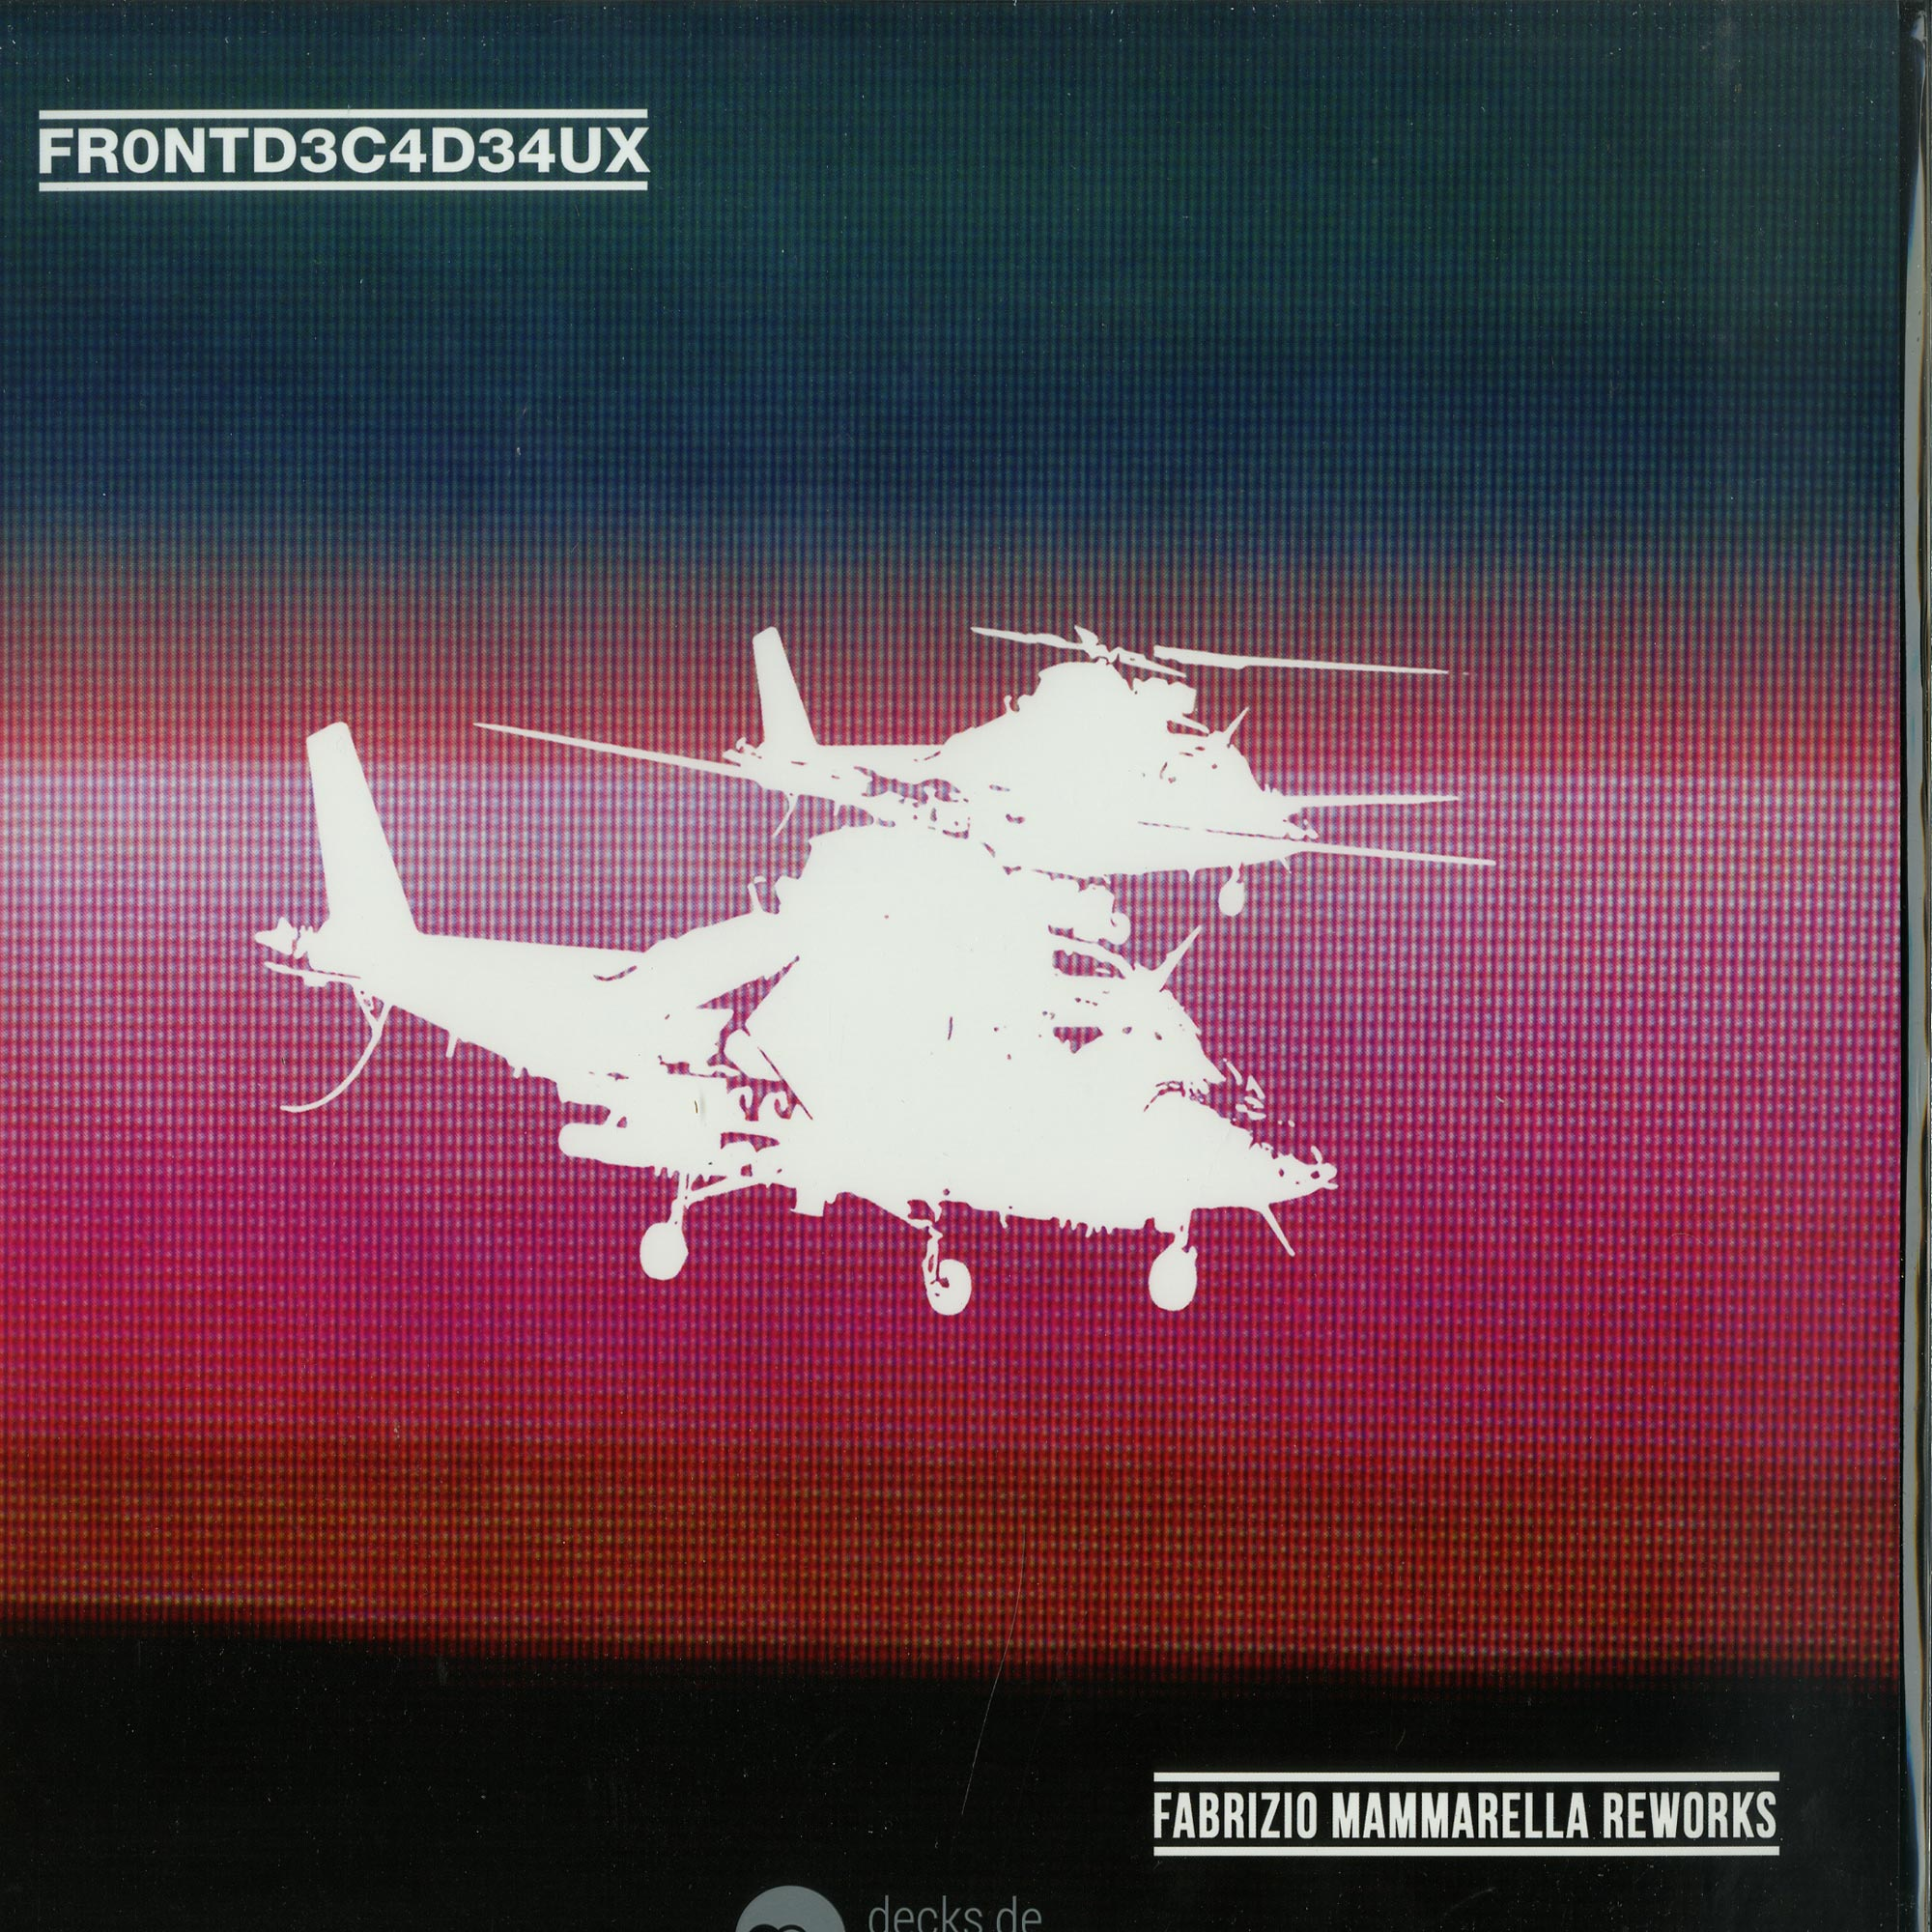 Front De Cadeaux - FABRIZIO MAMMARELLA REWORKS EP